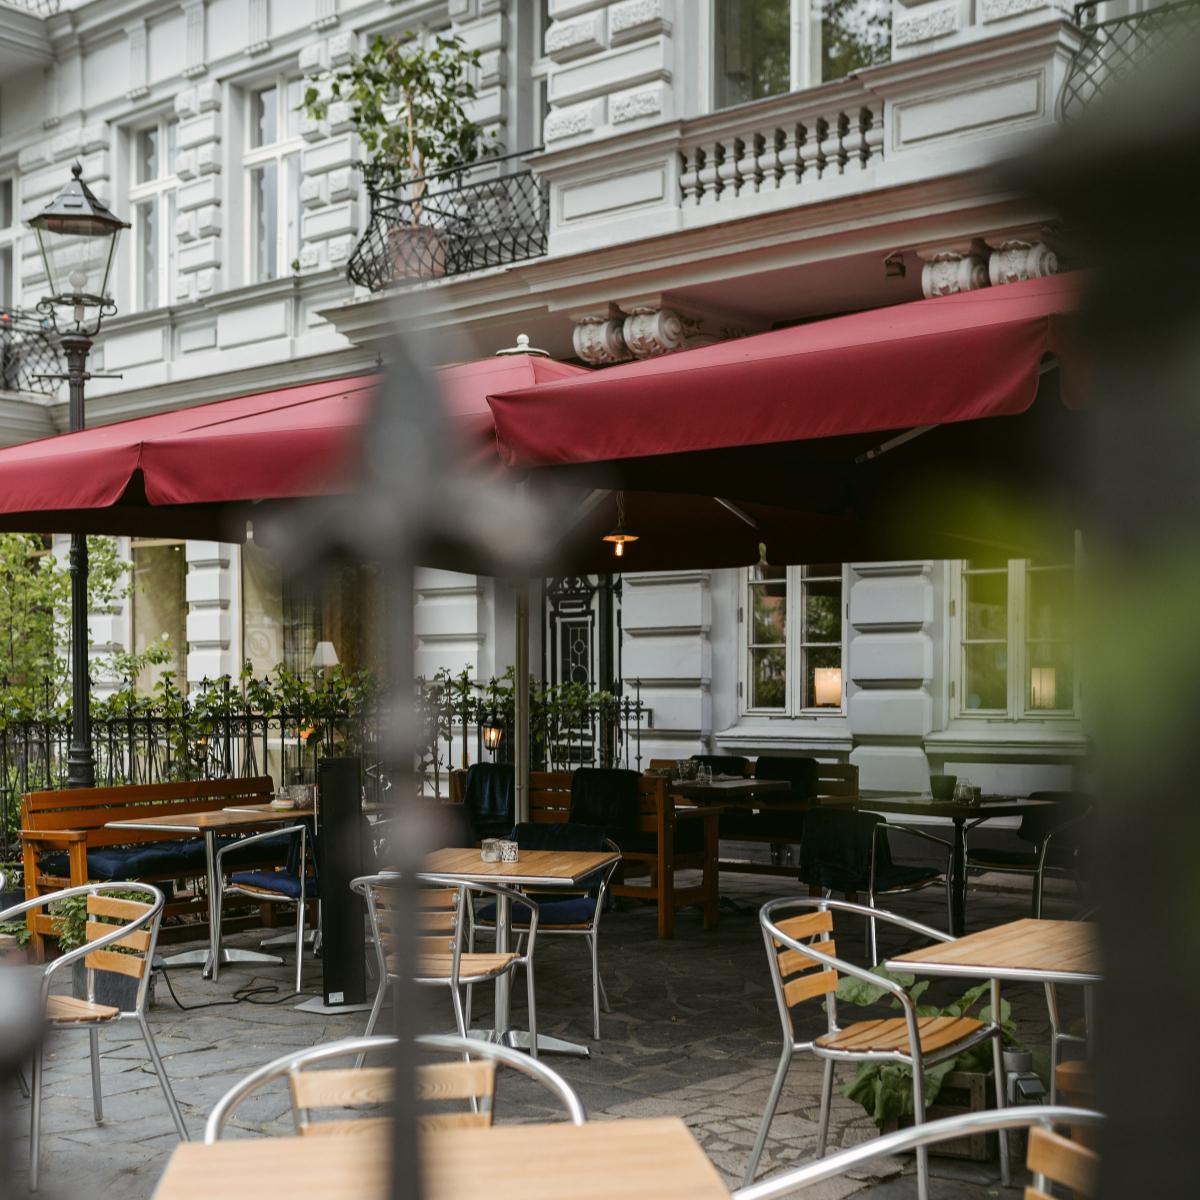 Restaurant Hoffgarten Berlin Charlottenburg (6)